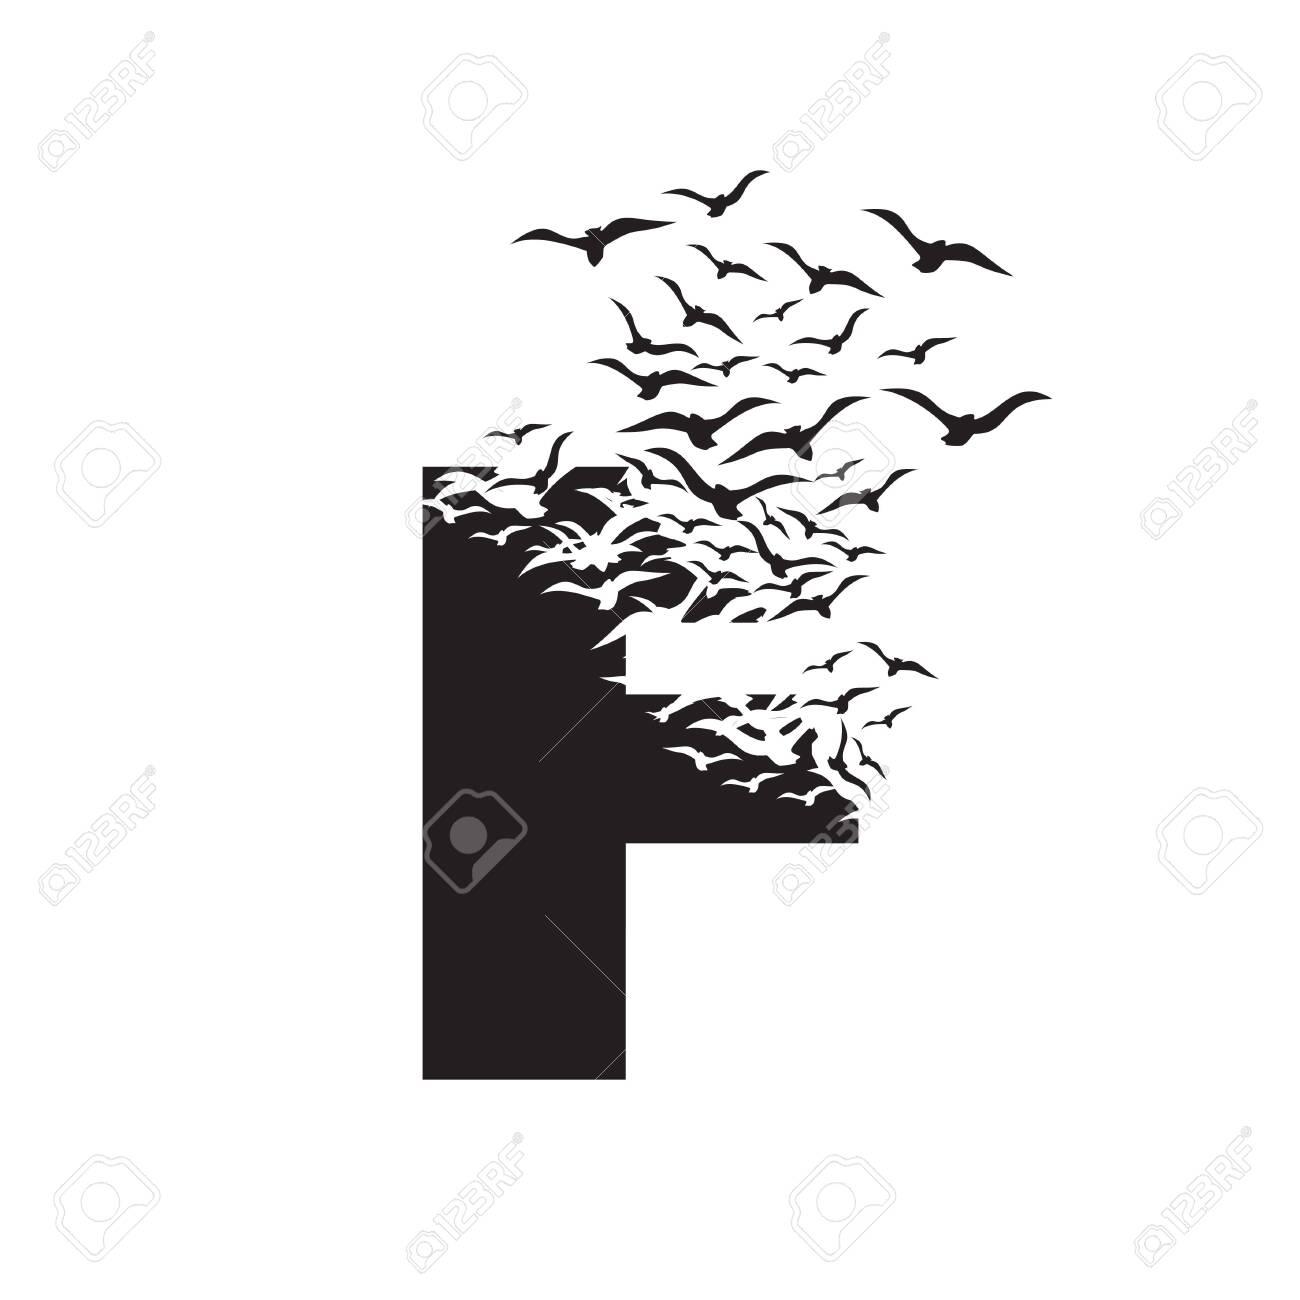 letter F with effect of destruction. Dispersion. Birds. - 135698732